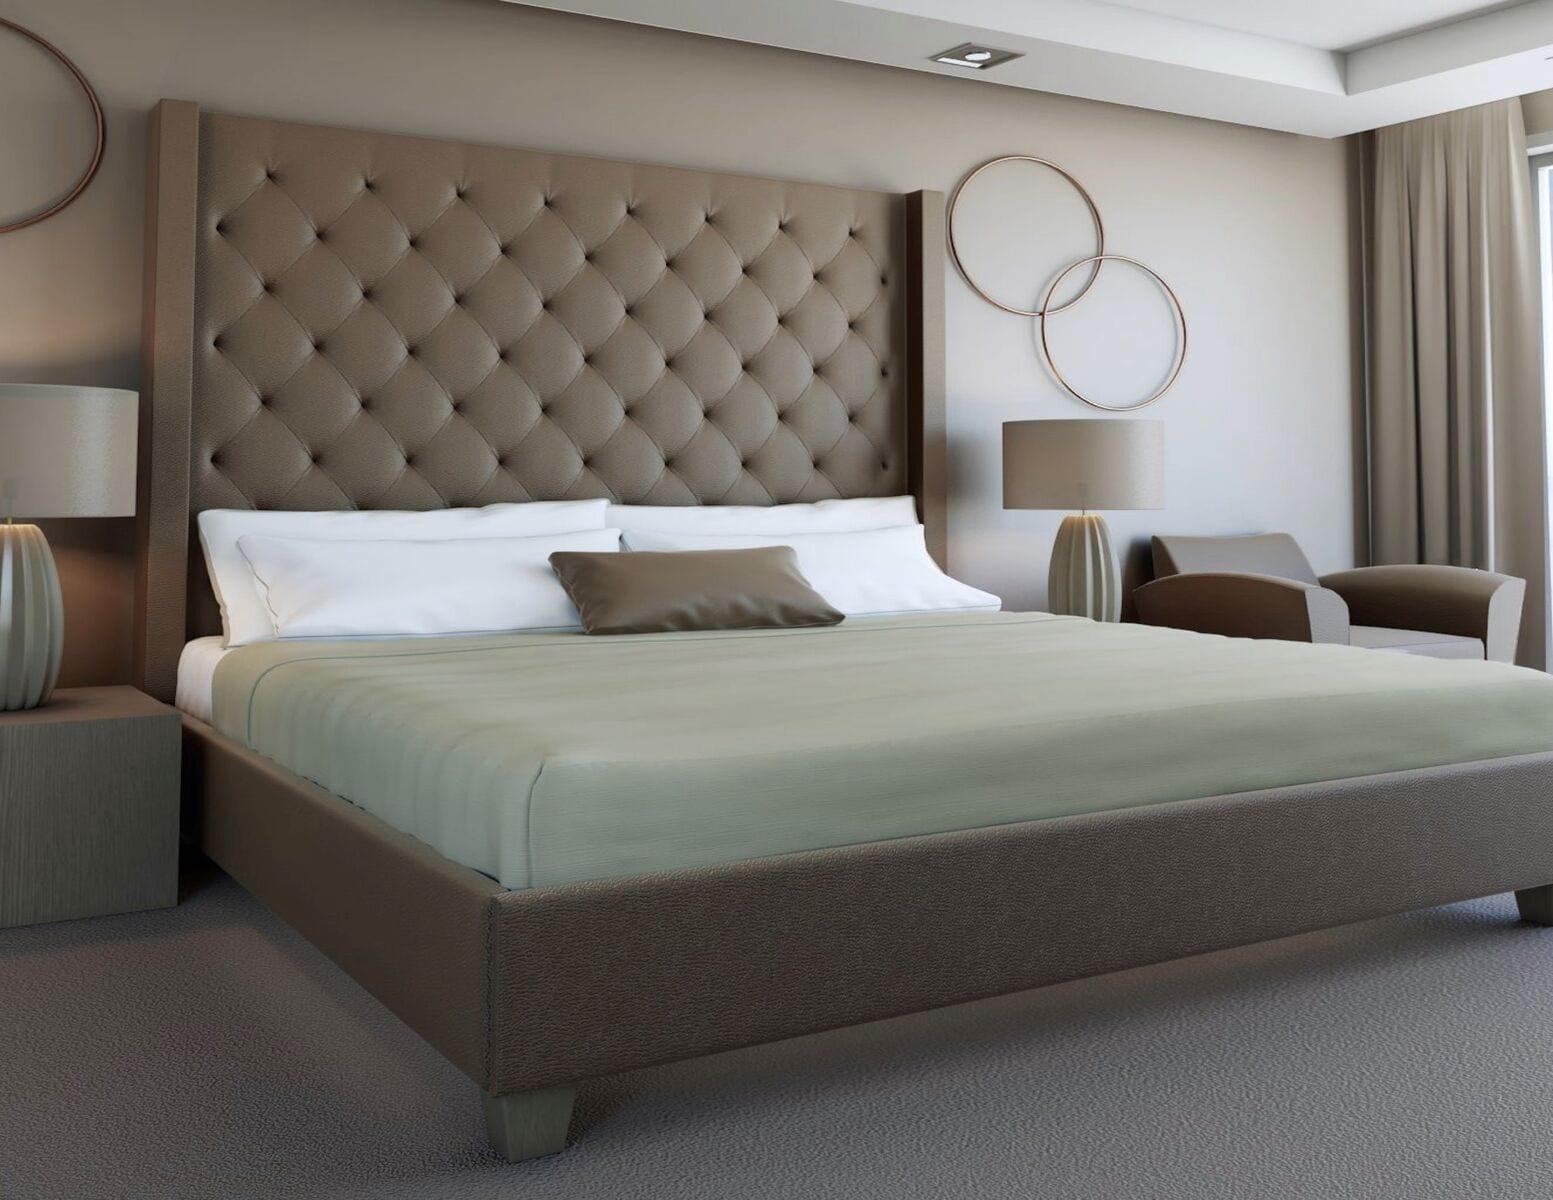 luxury headboard, wall mounted headboards, and custom upholstered bed